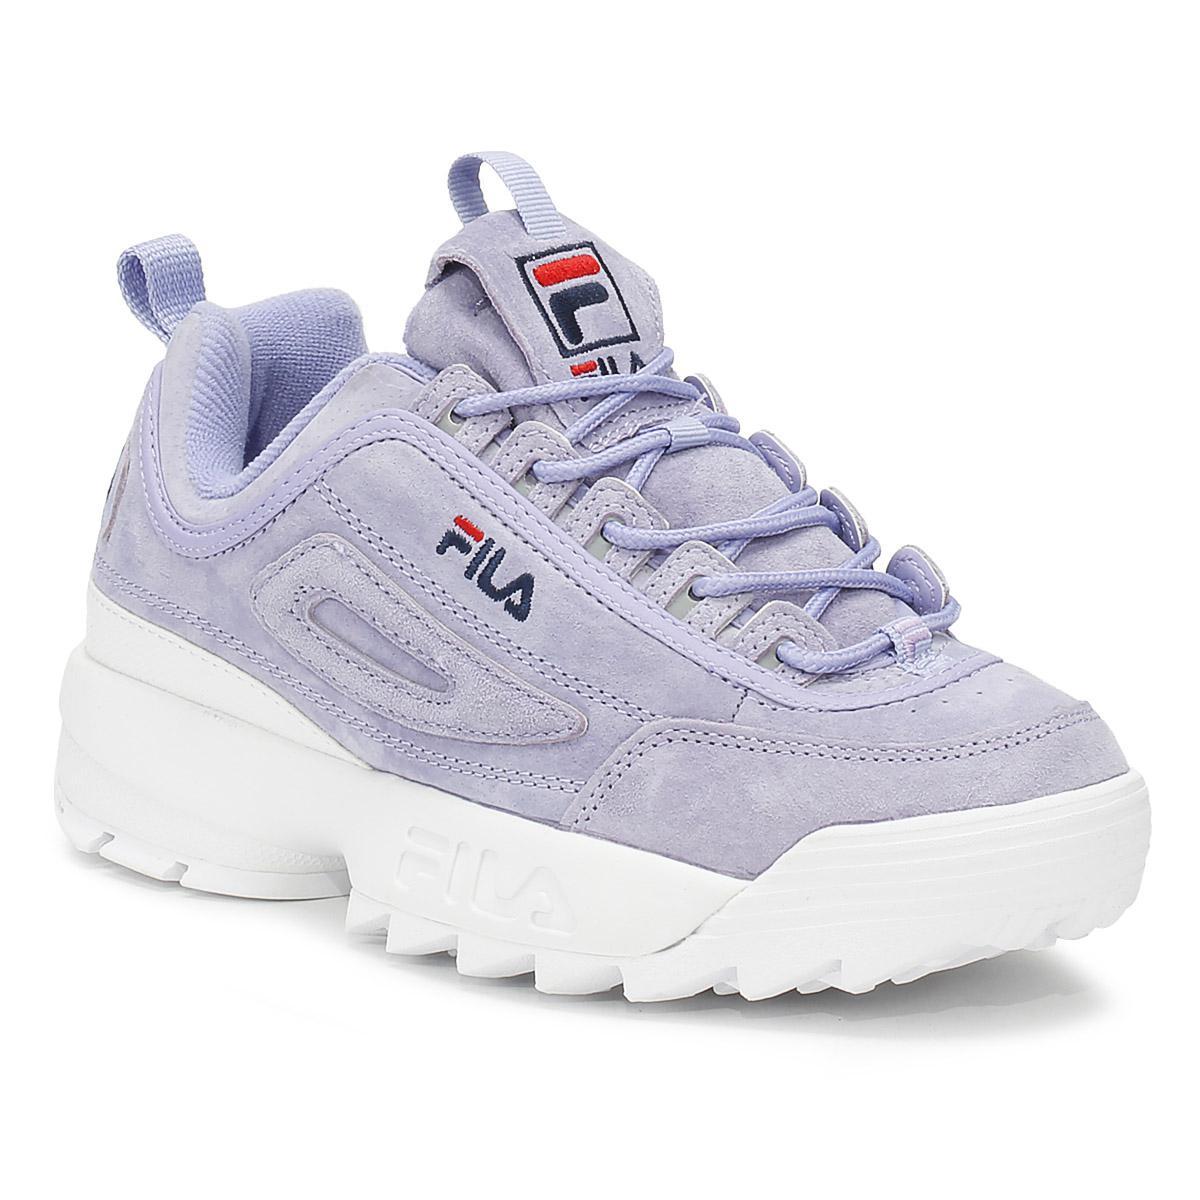 34254ab3d628 Lyst - Fila Disruptor Ii Womens Sweet Lavender Premium Suede ...